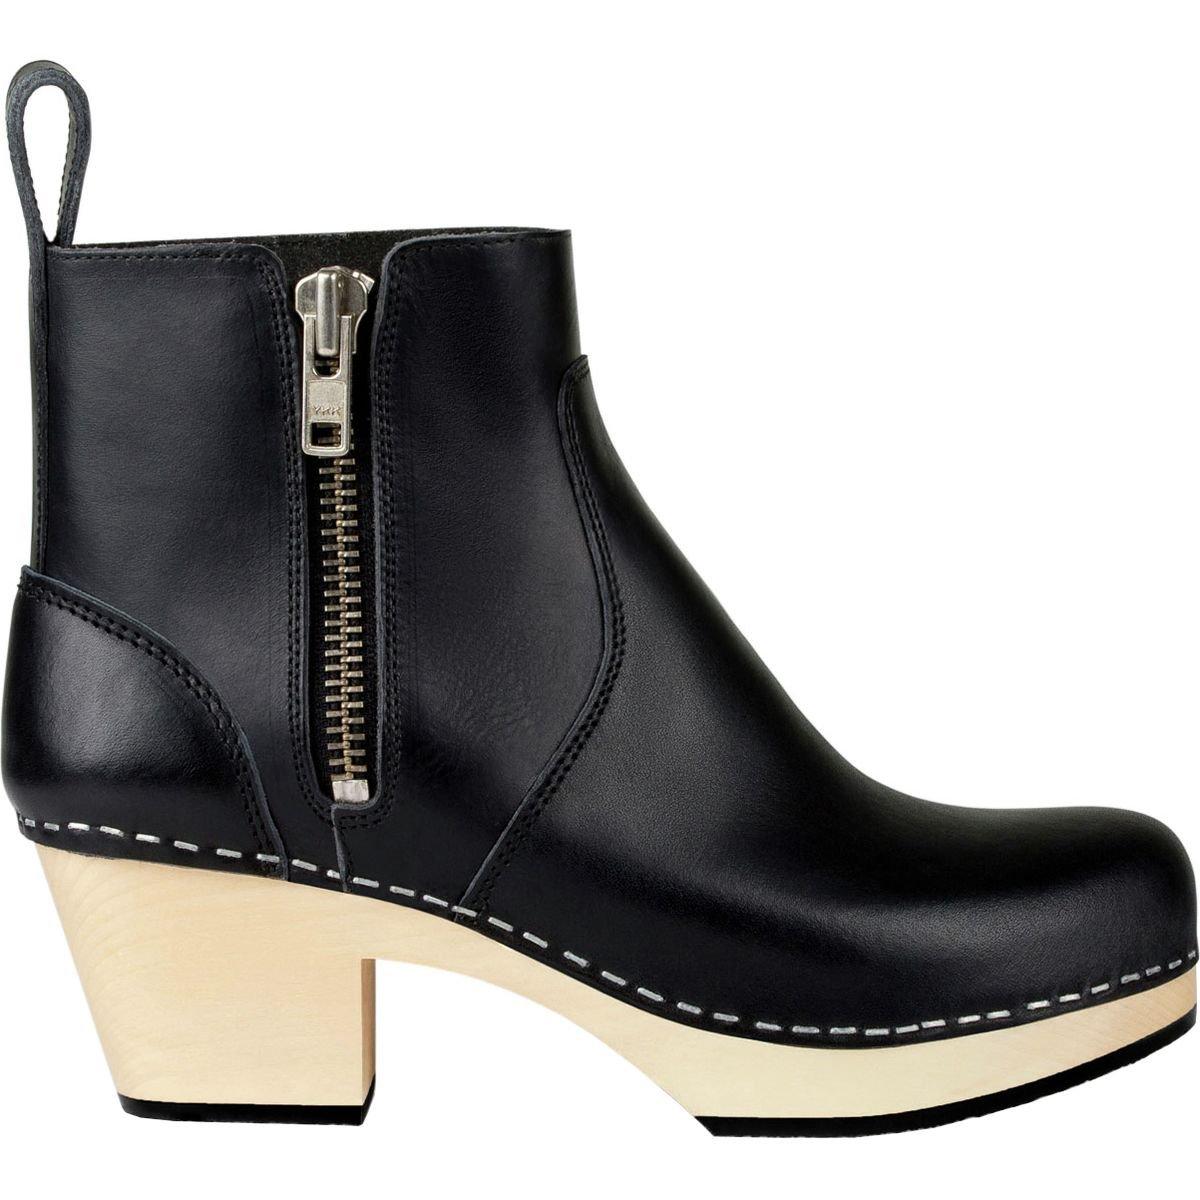 swedish hasbeens Women's Zip It Emy Ankle Boot B06XD5838X 37 Regular EU (7 US)|Black